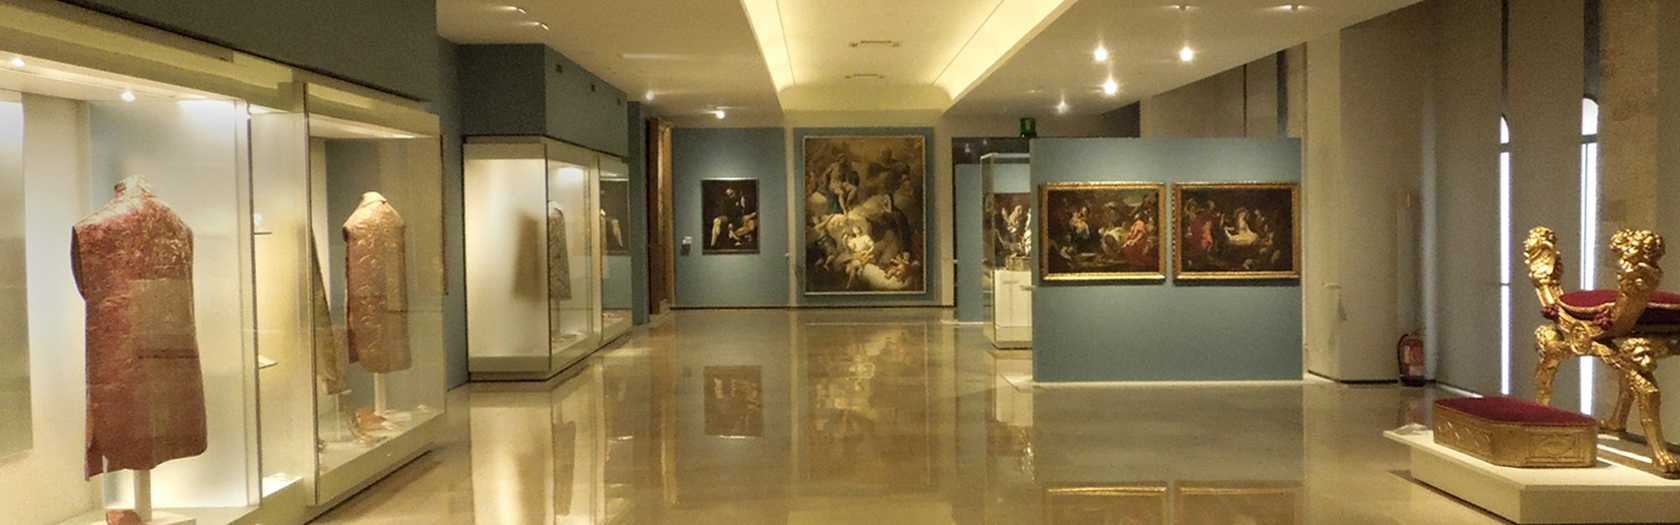 4 giugno musei gratis elenco italia